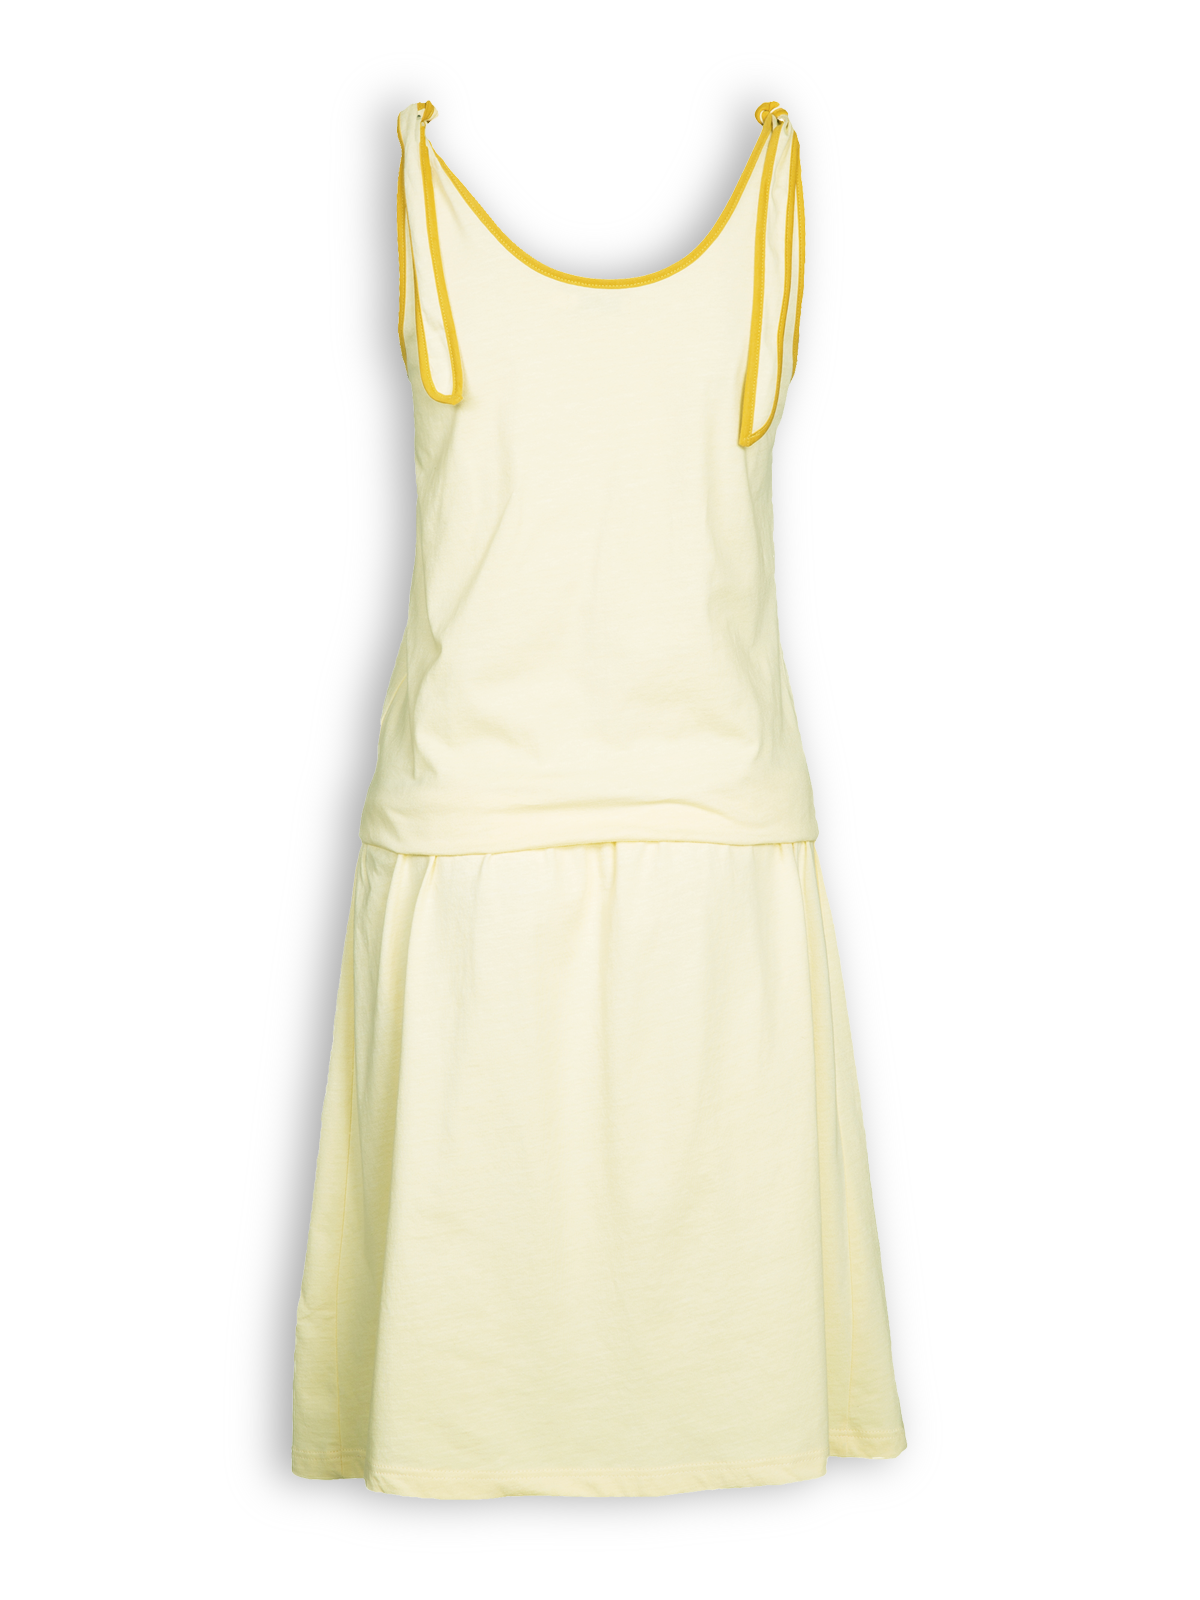 Kleider Damen Pastell  miami 2021